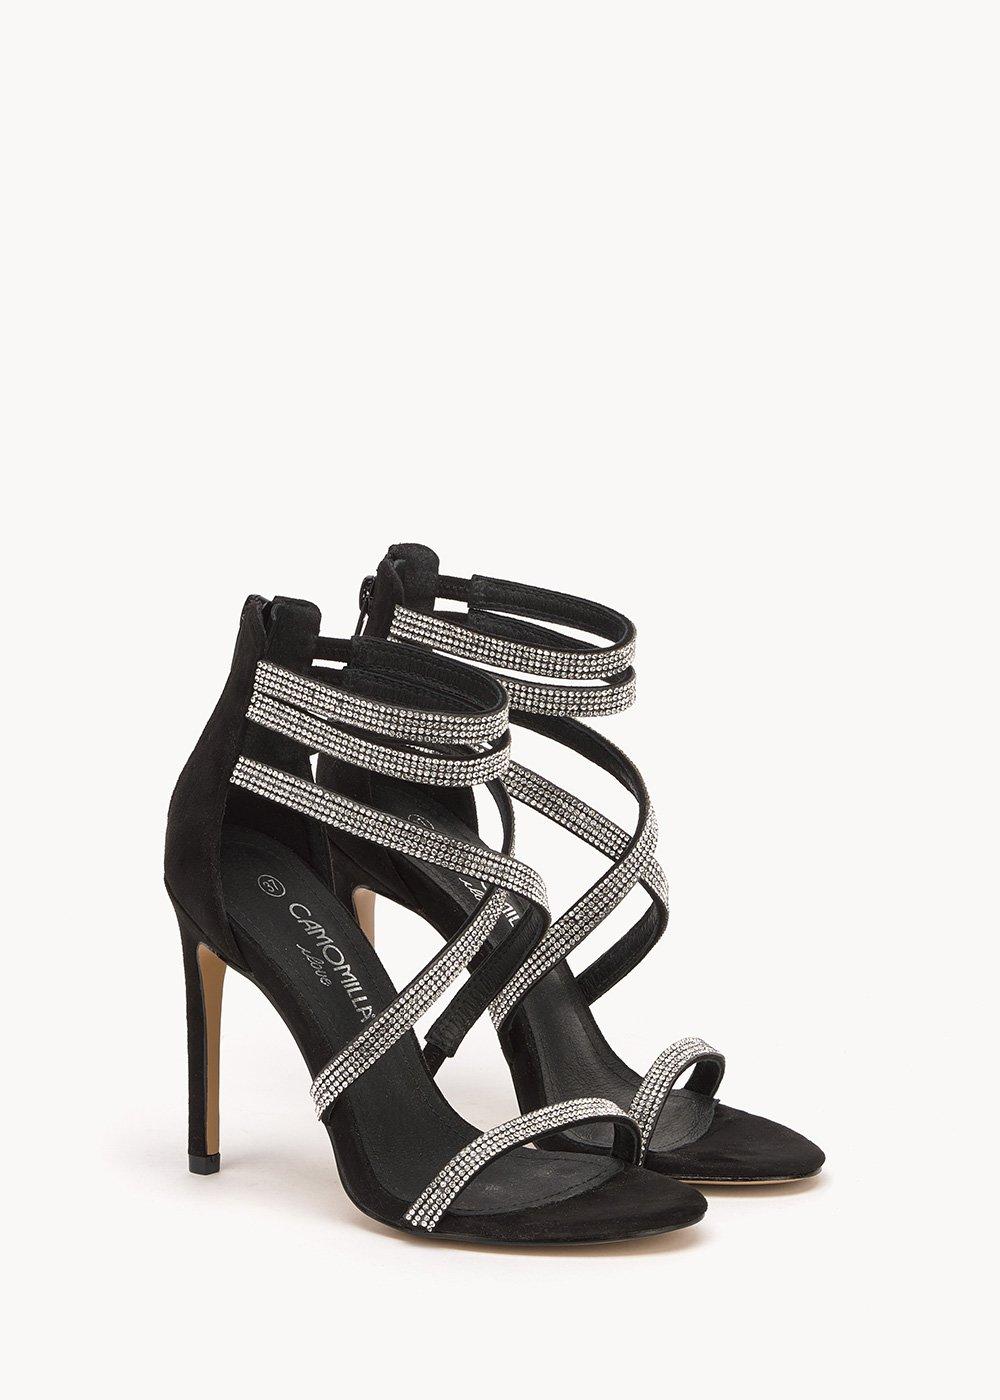 Sandali Shyla con dettagli strass - Black - Donna